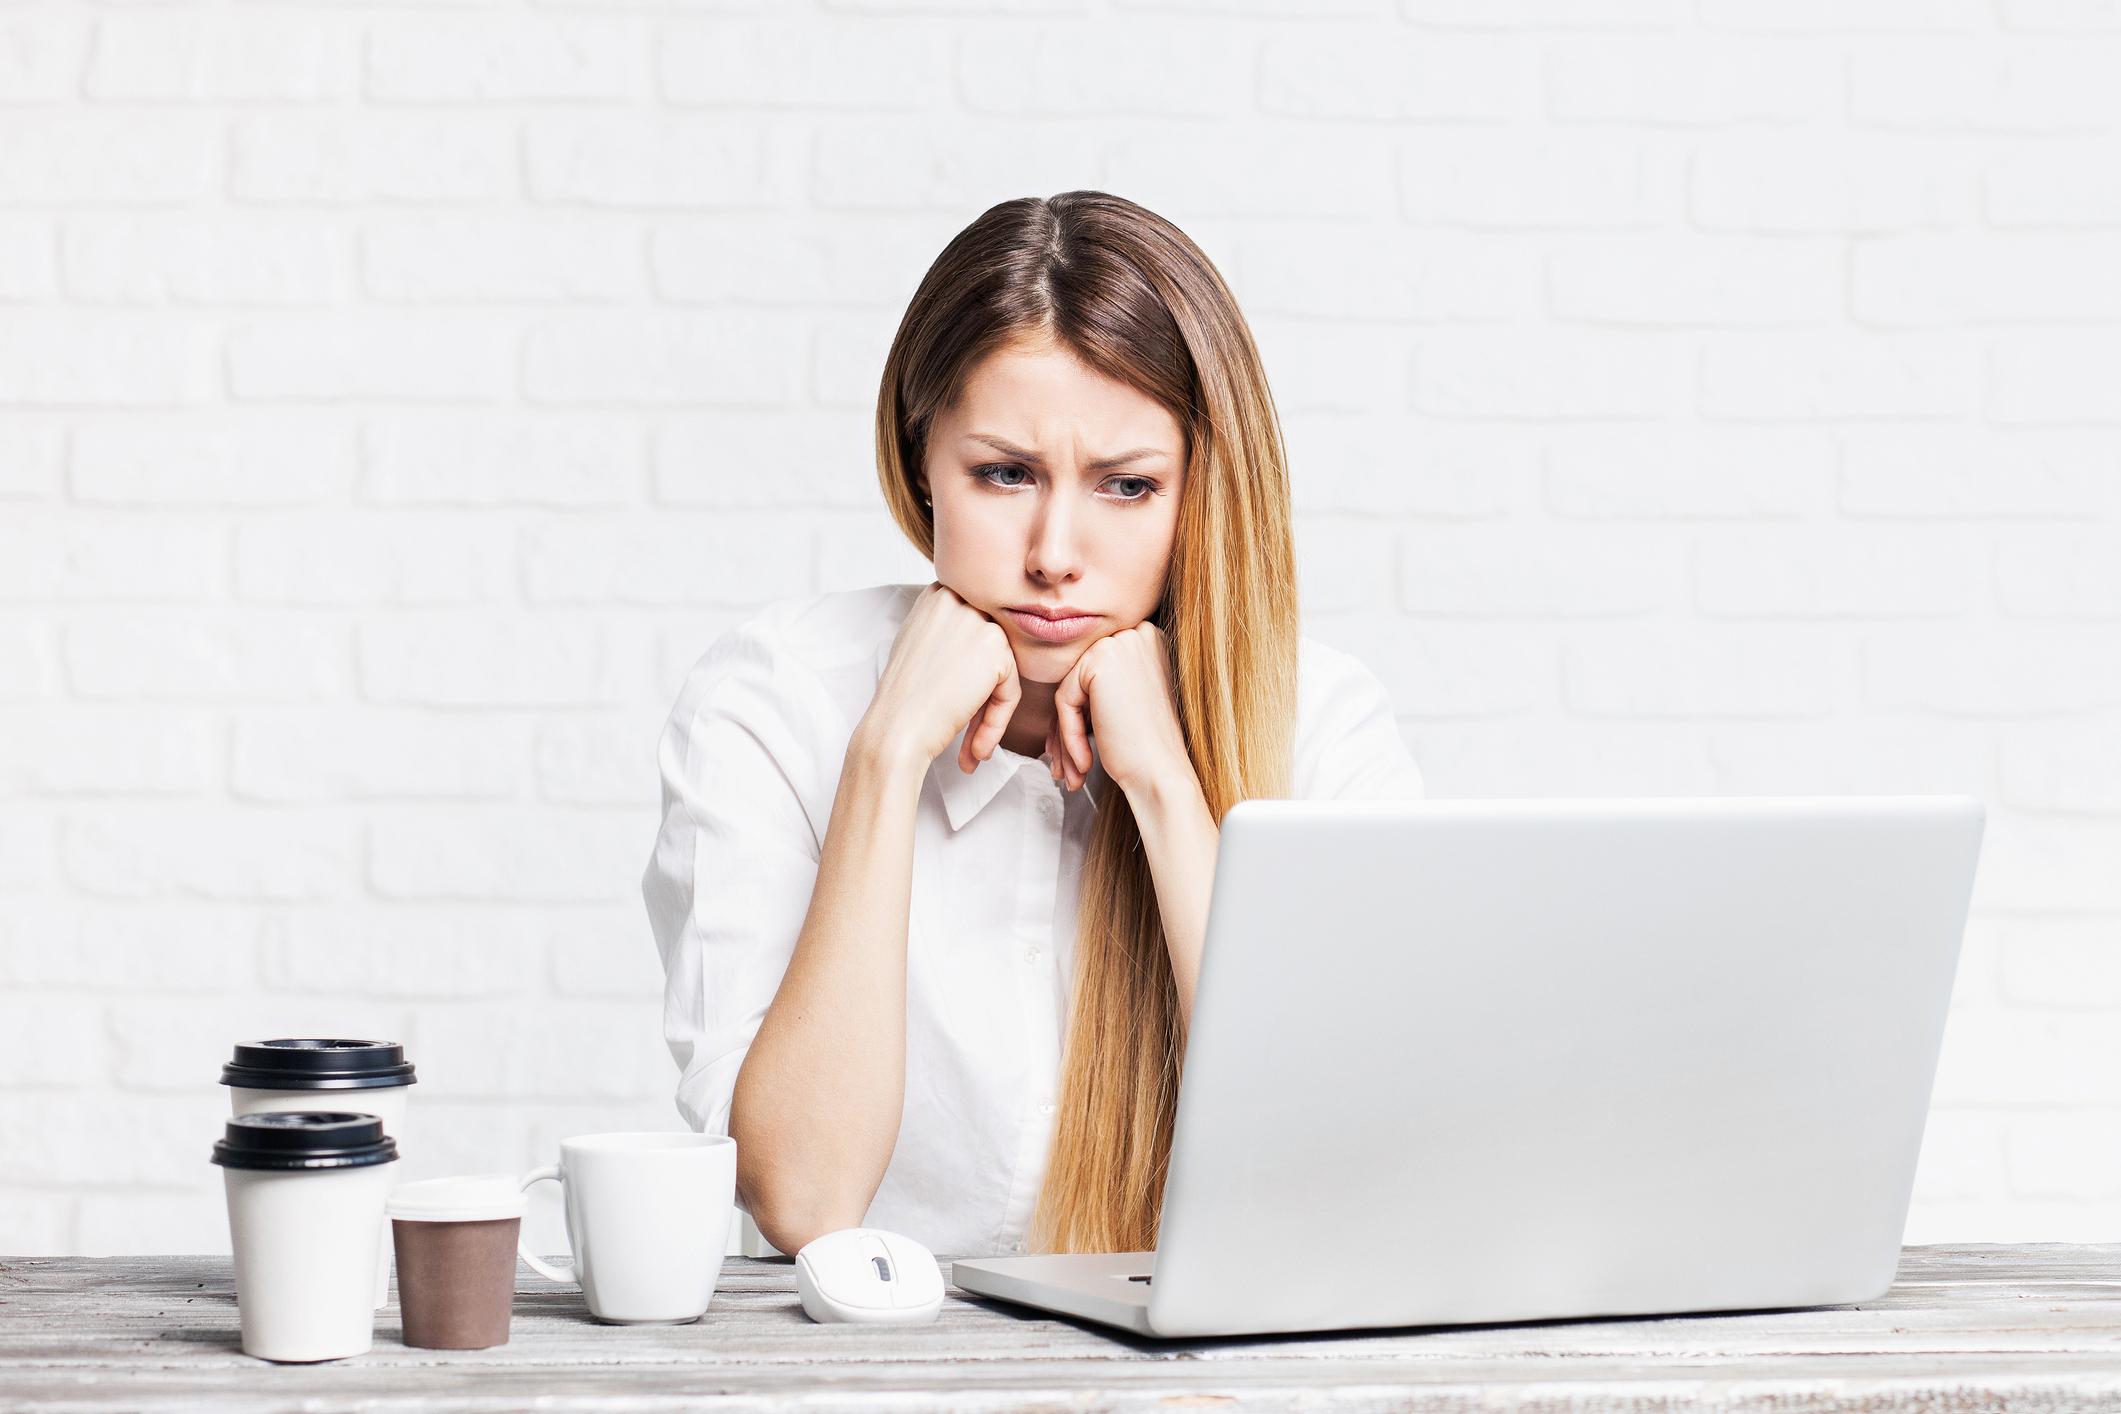 Woman at a laptop, looking sad